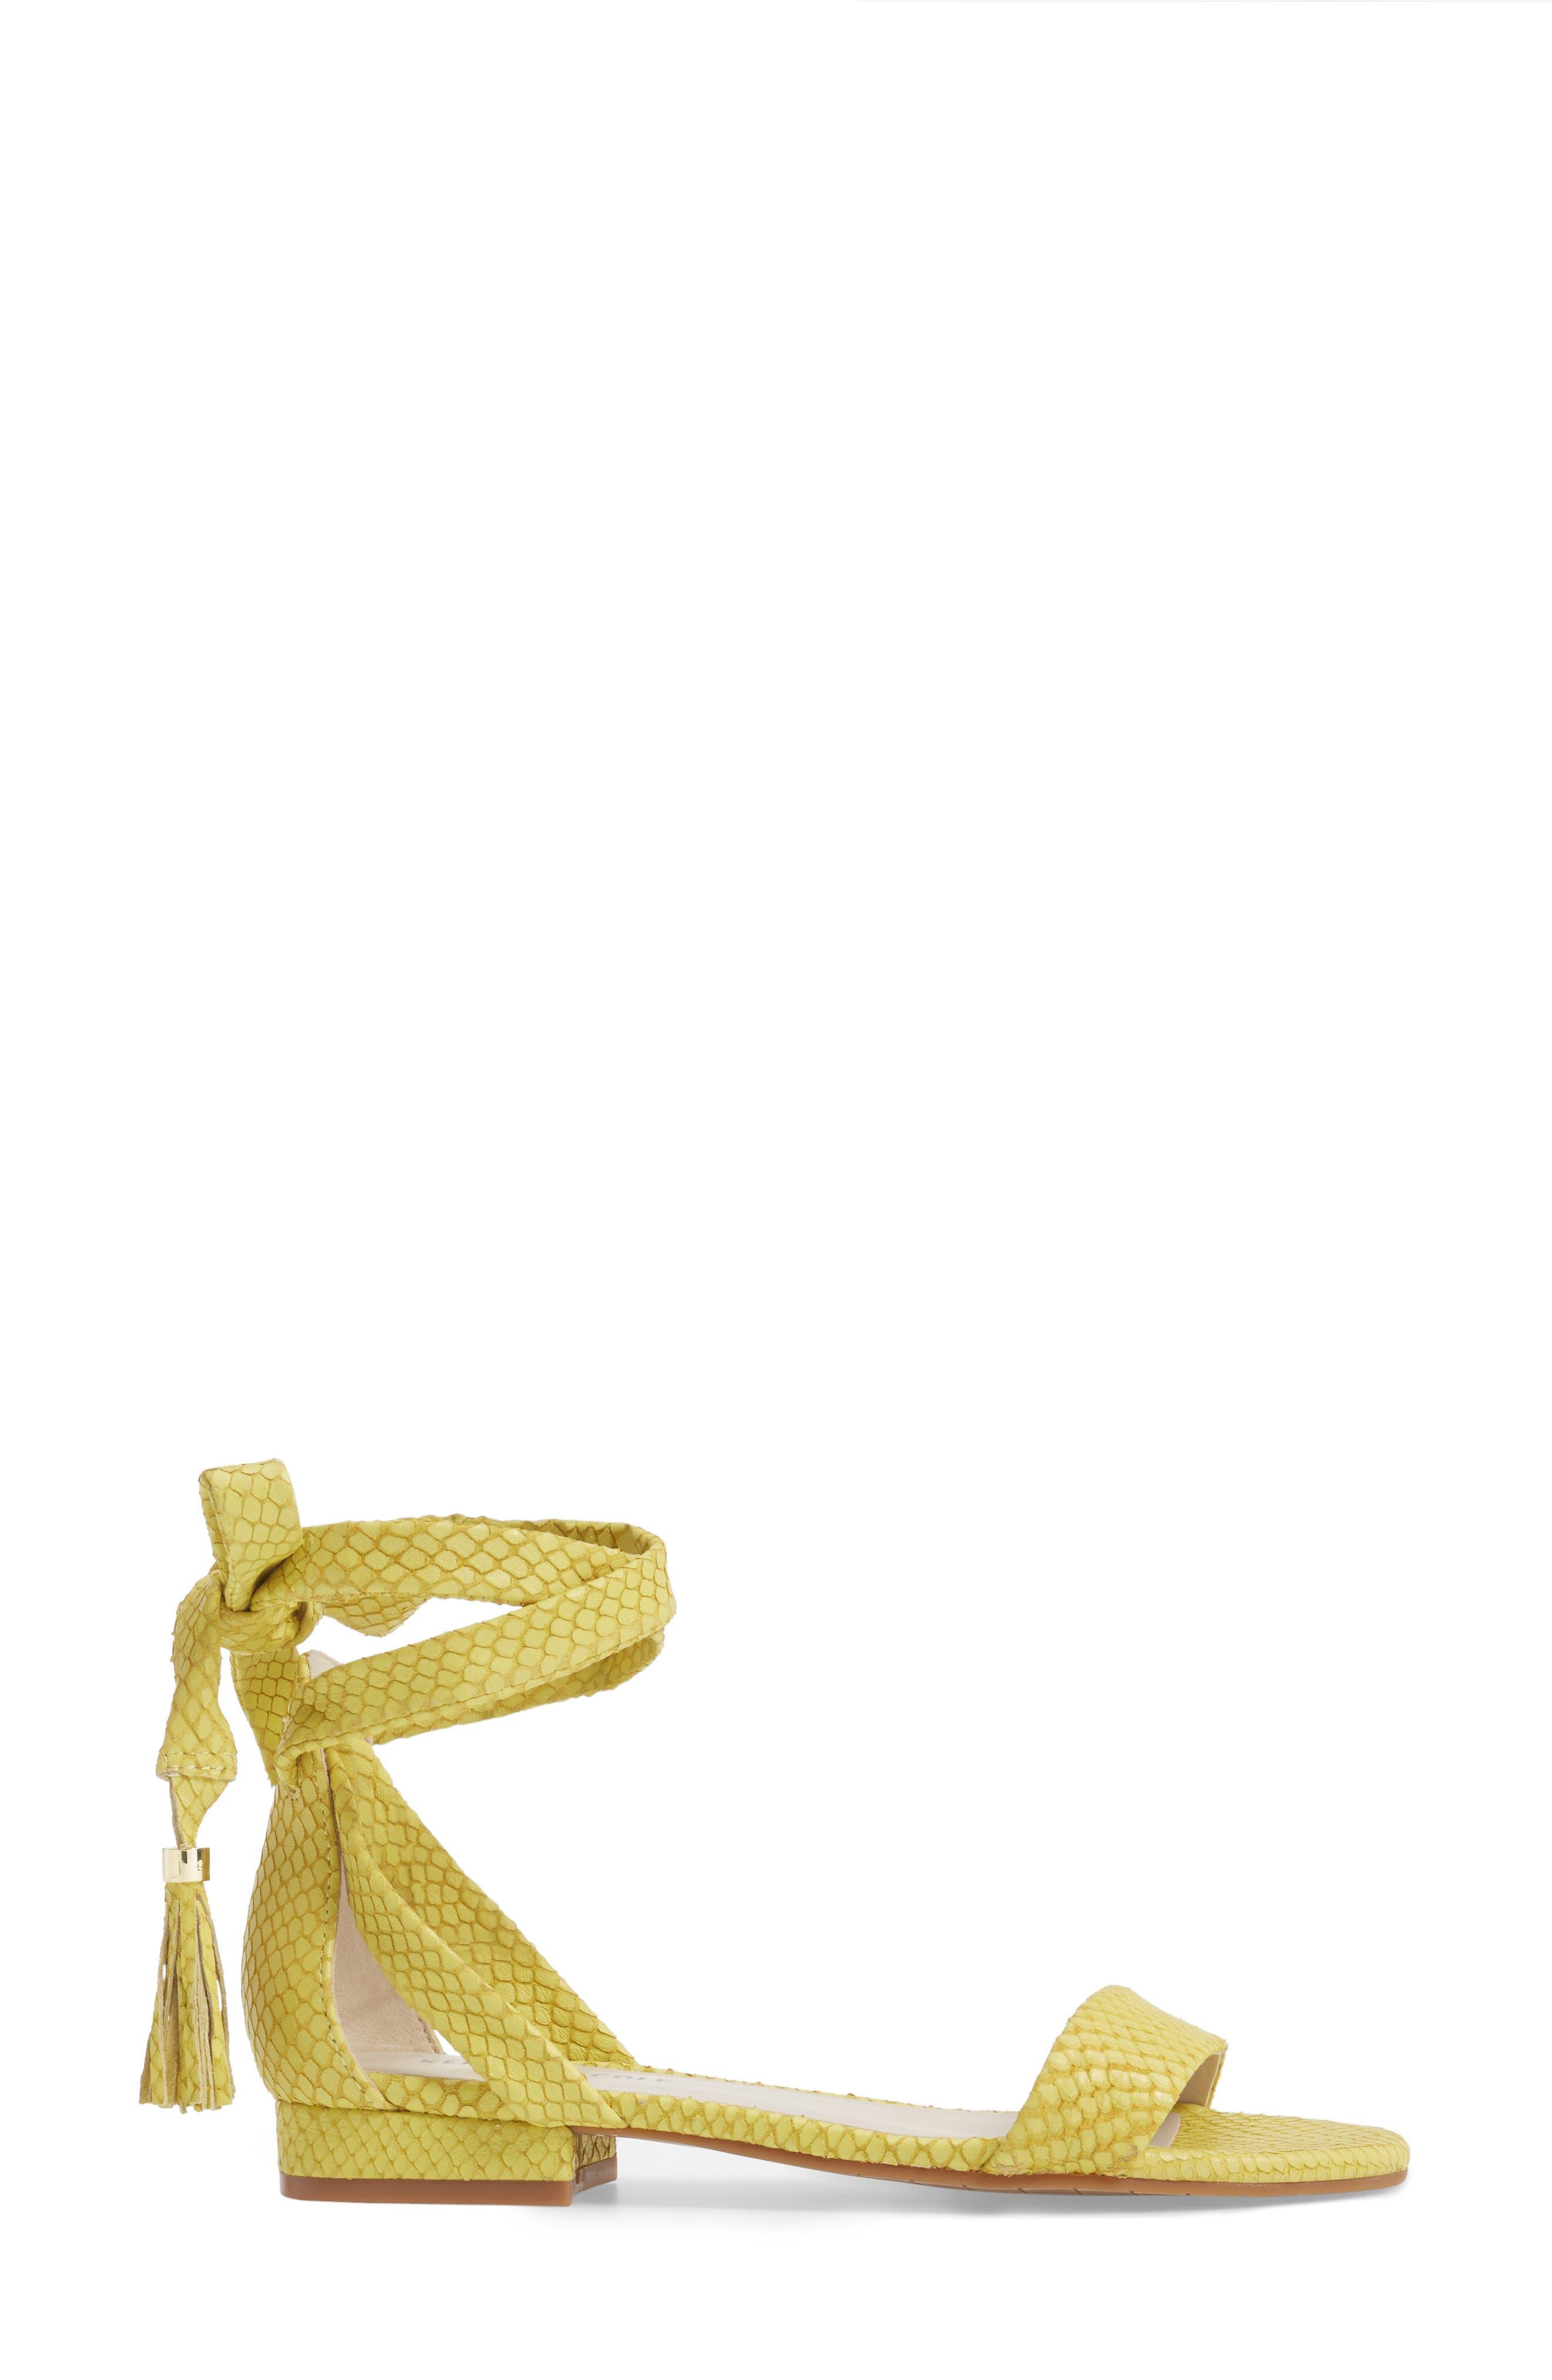 Valen Tassel Lace-Up Sandal,                             Alternate thumbnail 42, color,